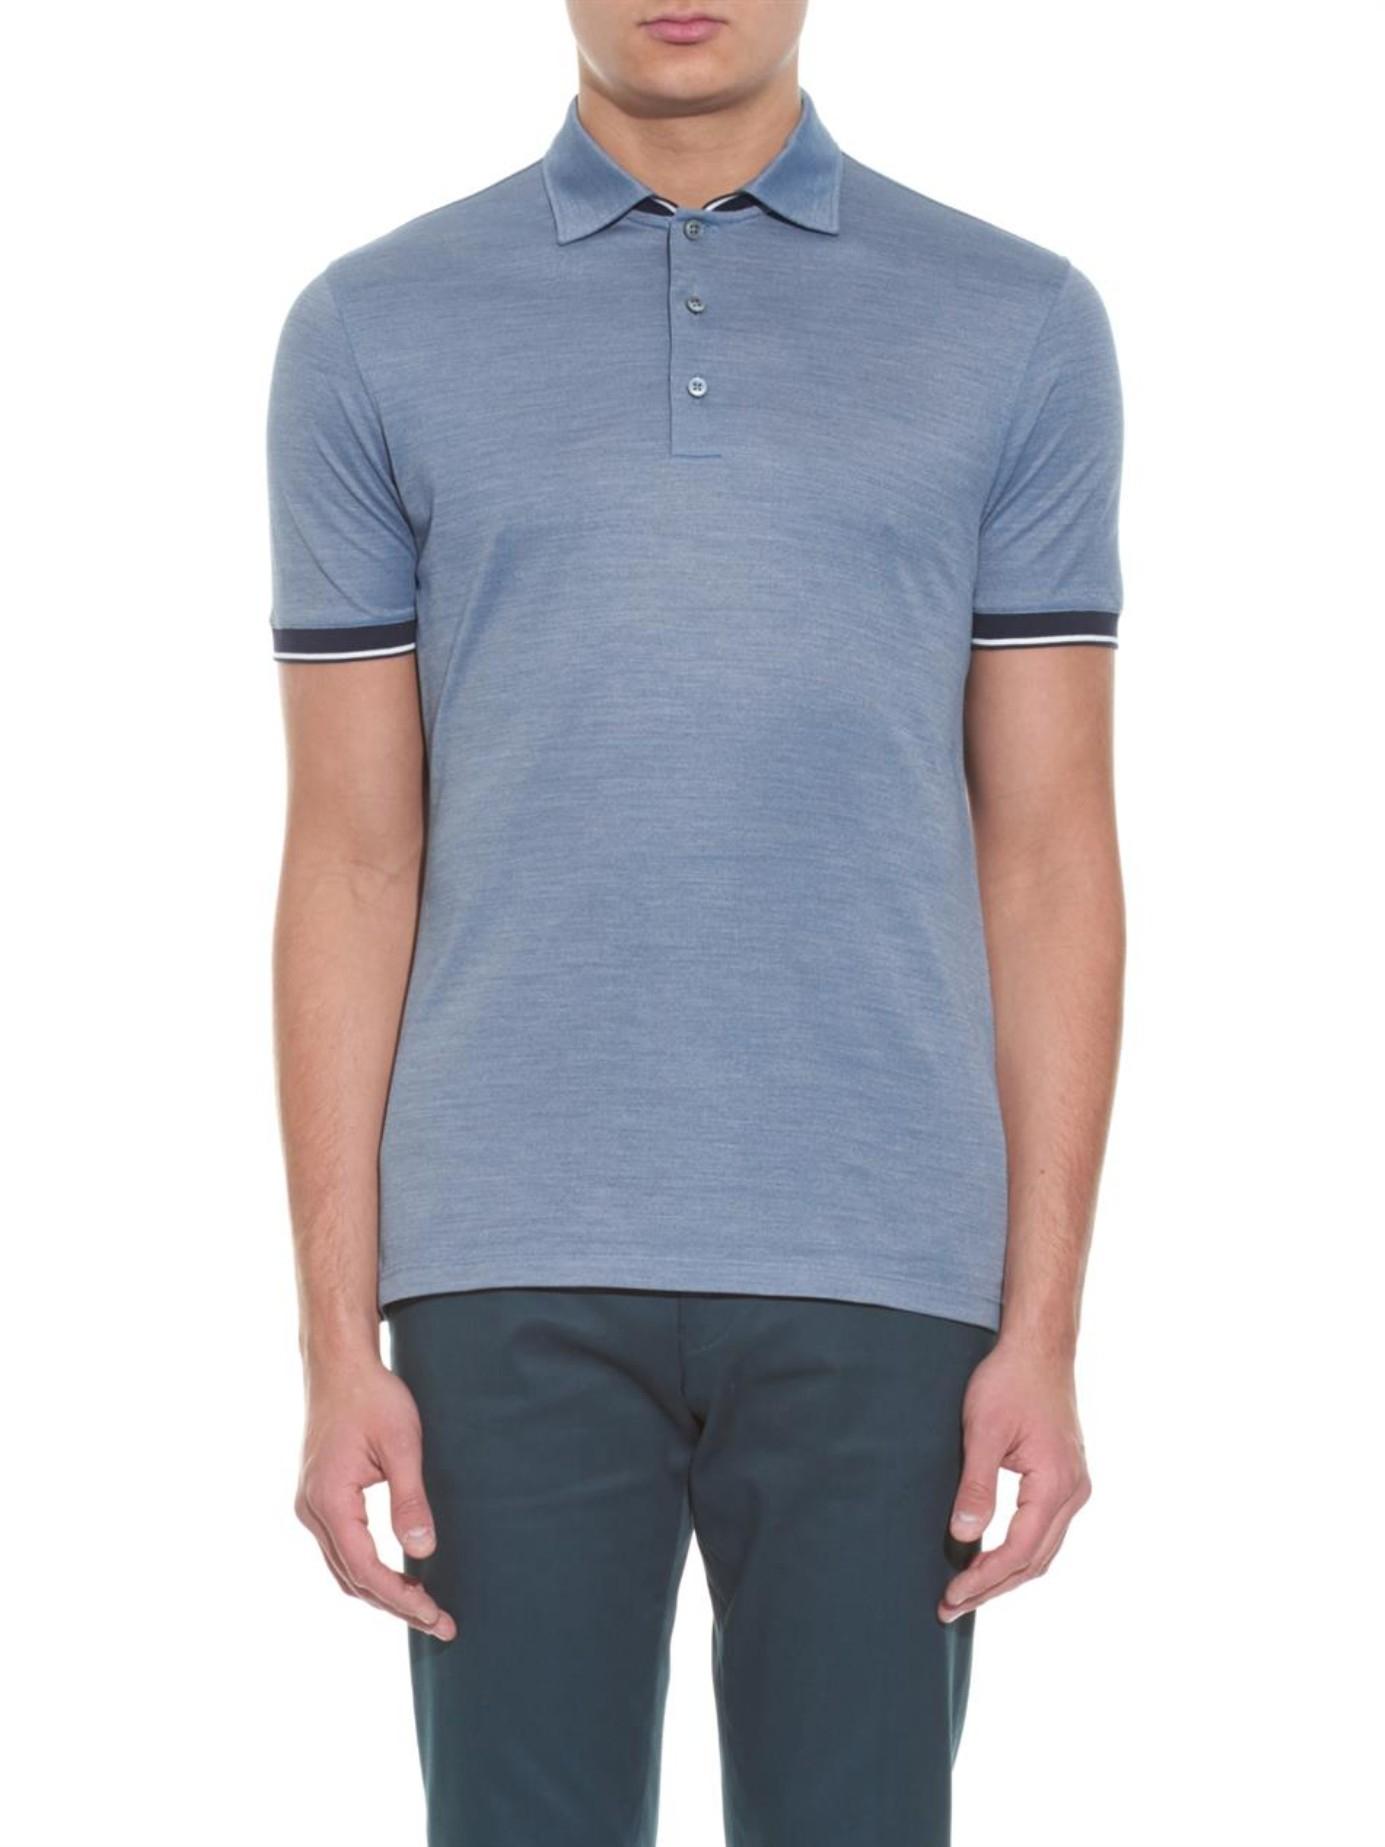 ermenegildo zegna silk and cotton blend polo shirt in blue for men lyst. Black Bedroom Furniture Sets. Home Design Ideas